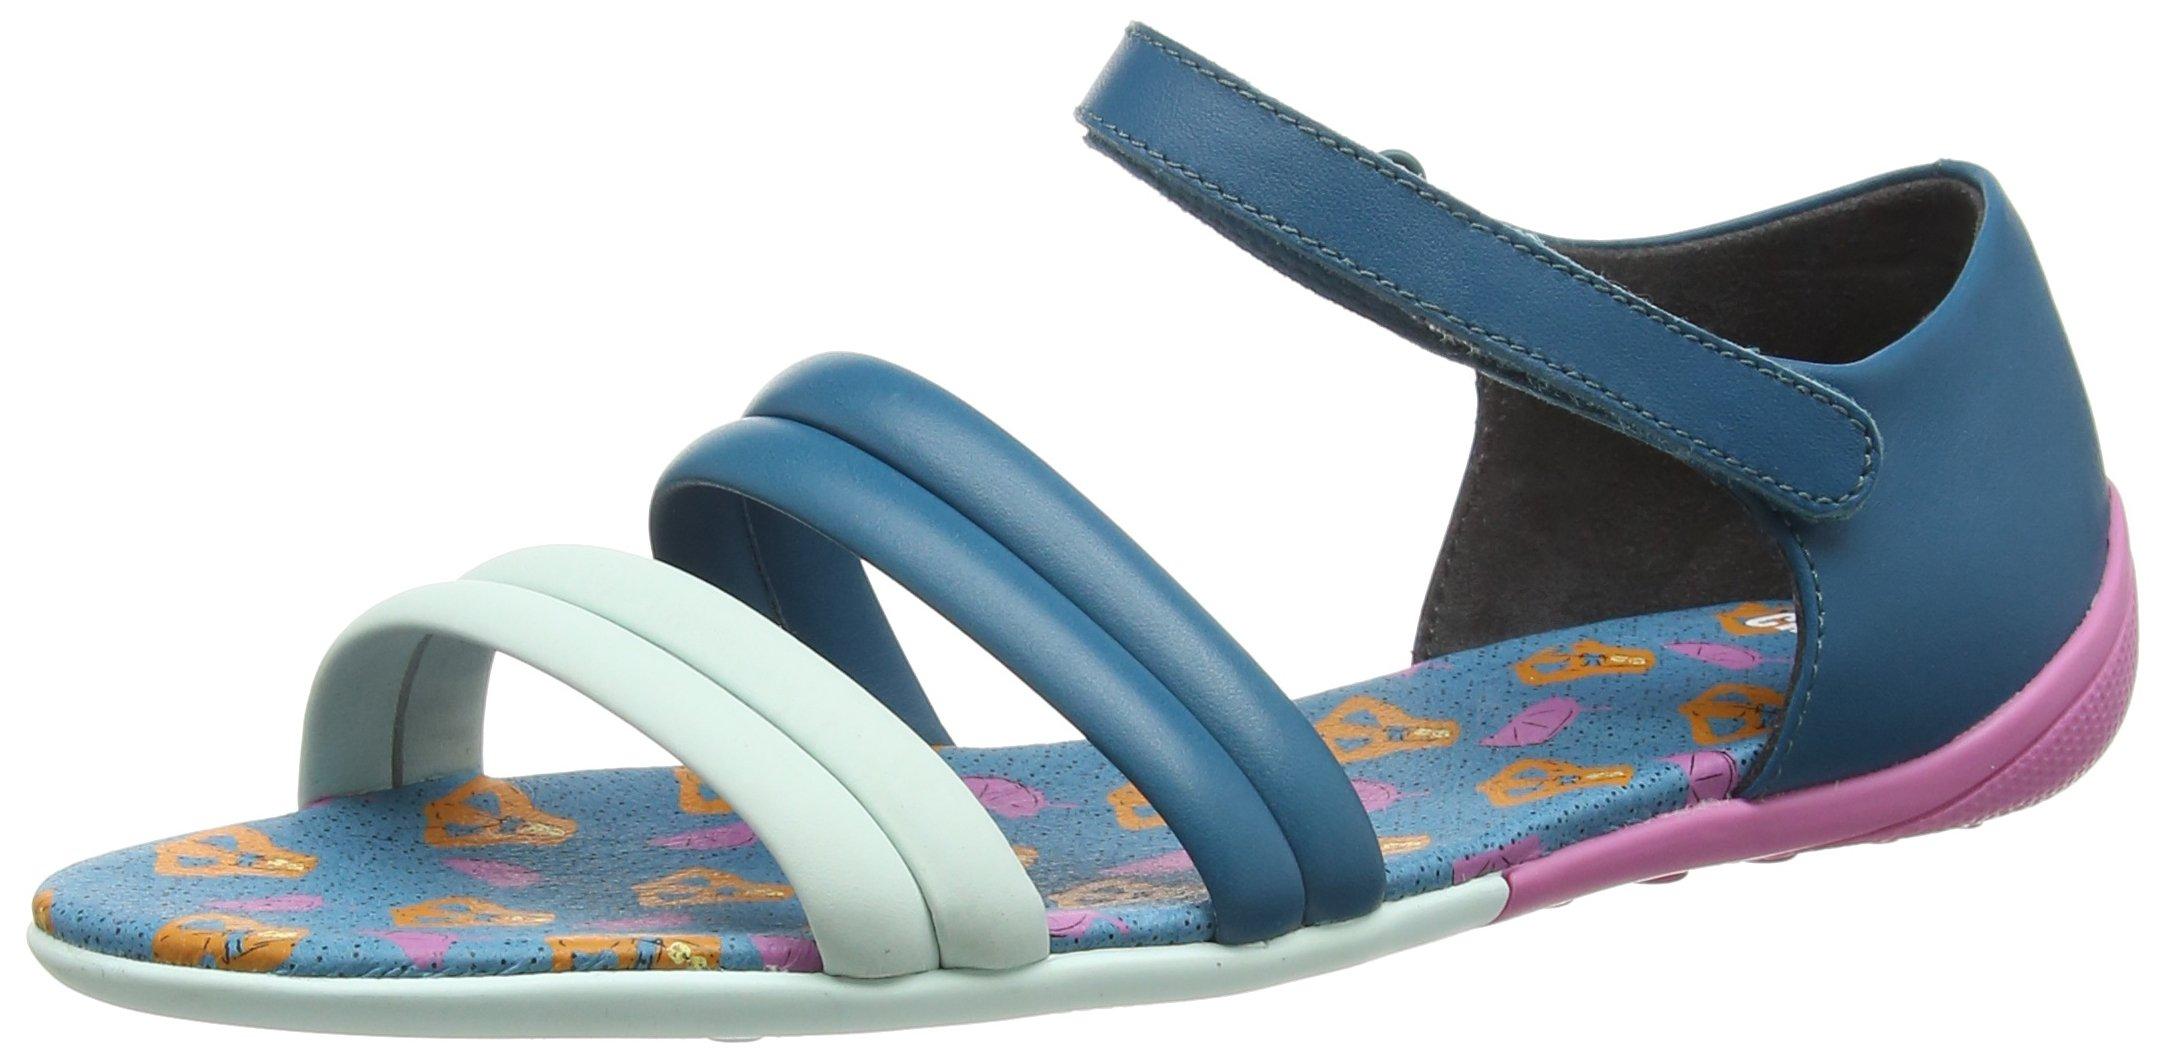 Camper Women's Peu Circuitsandal Sandal, Turquoise Aqua, 39 EU/9 M US